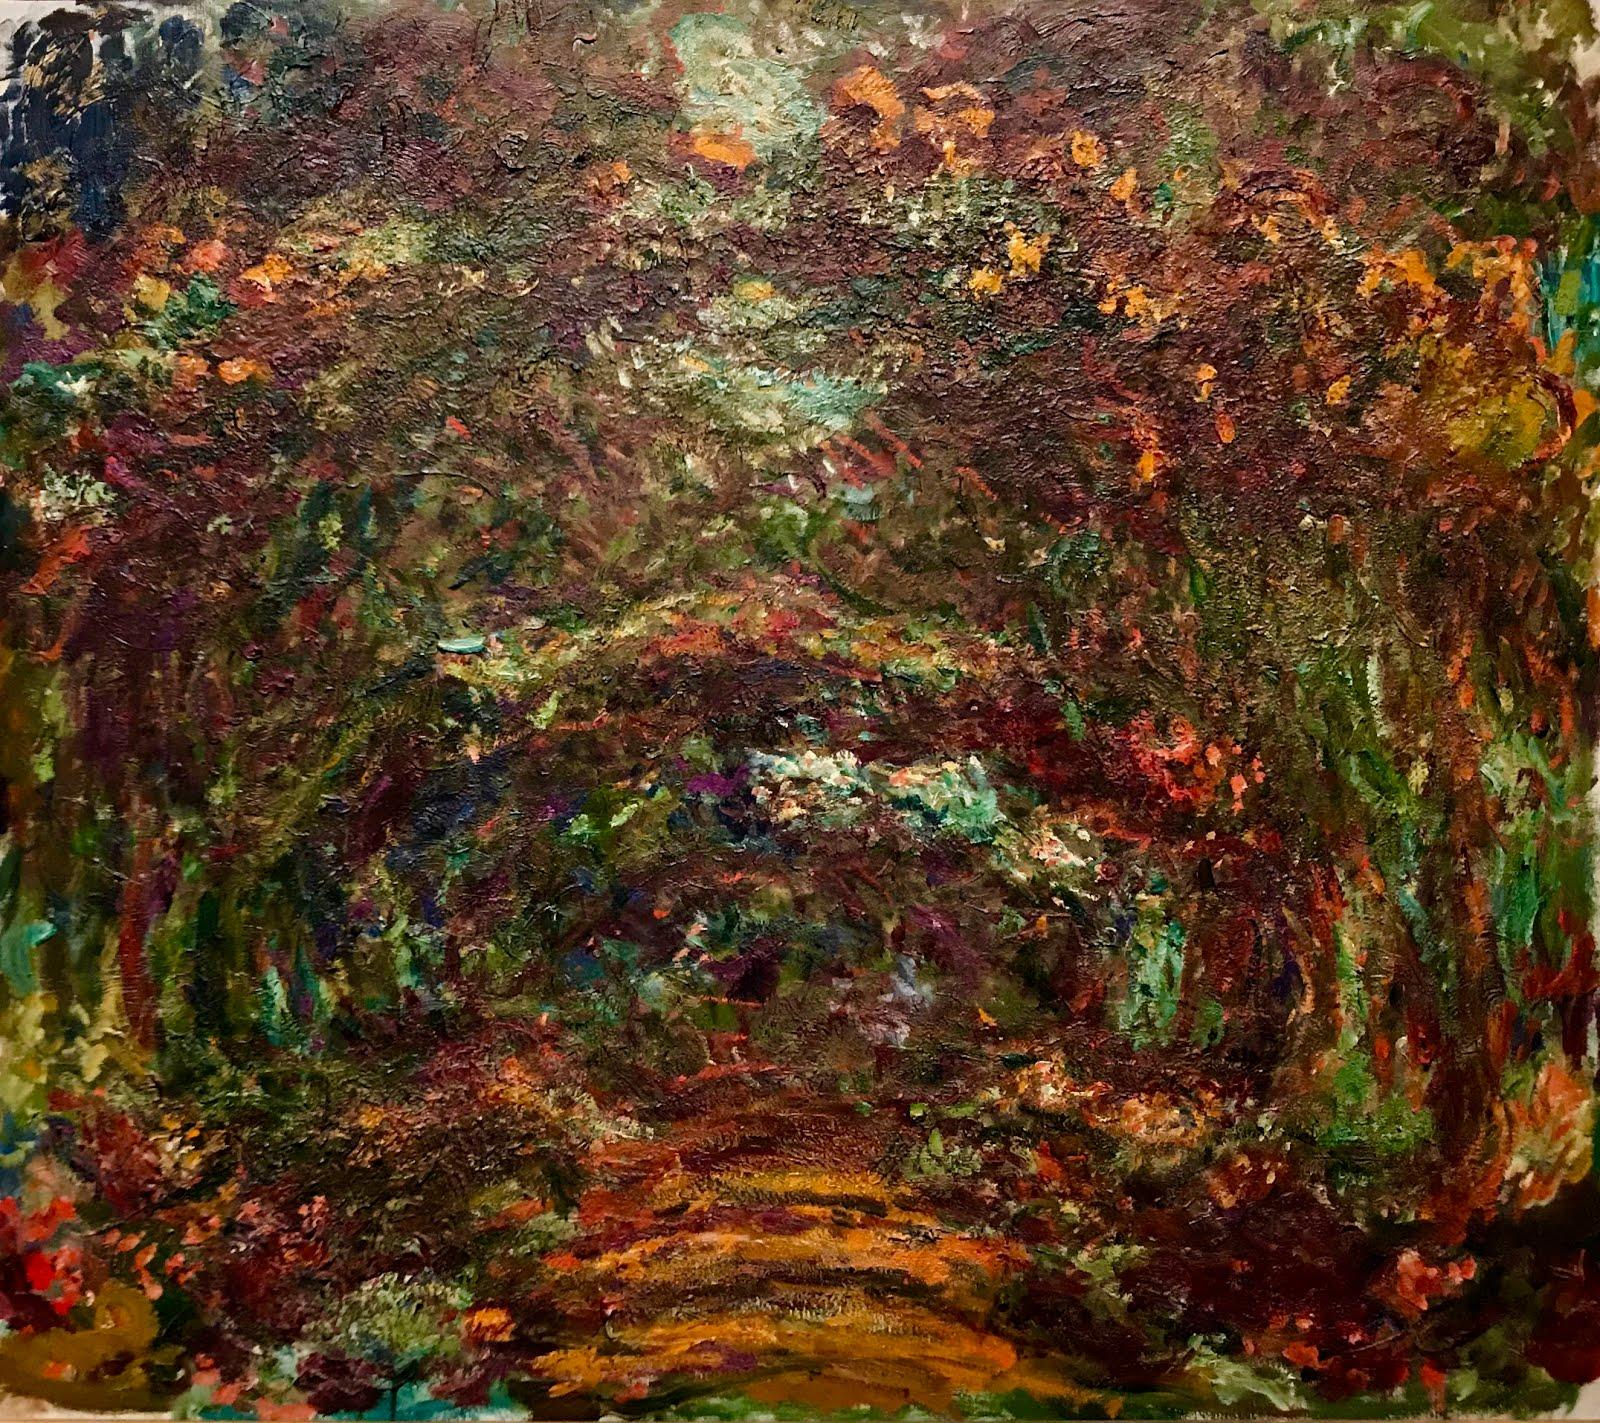 пейзаж < Тропа под аркой, увитой розами, Живерни >:: Клод Моне, описание картины - Моне Клод (Claude Monet) фото